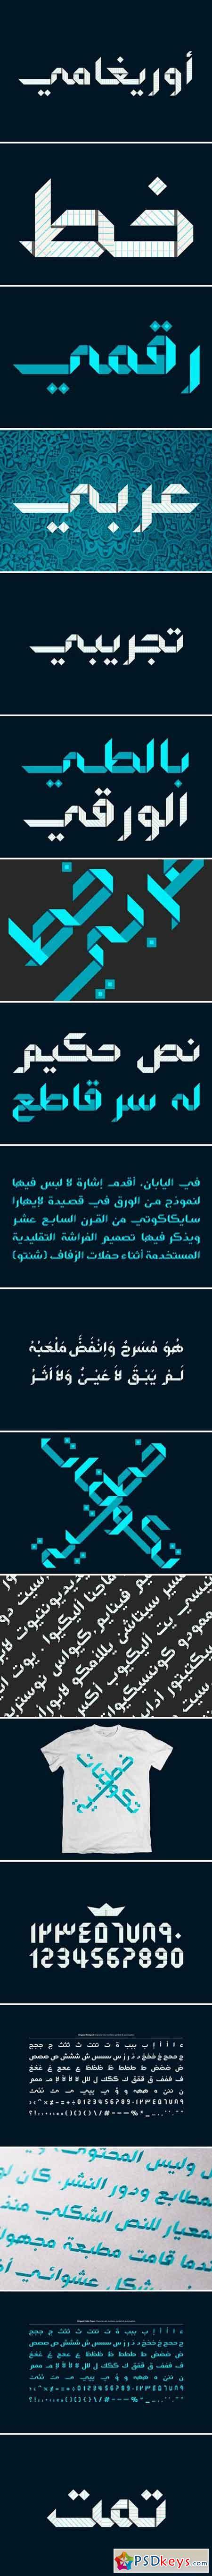 Arabic » Free Download Photoshop Vector Stock image Via Torrent